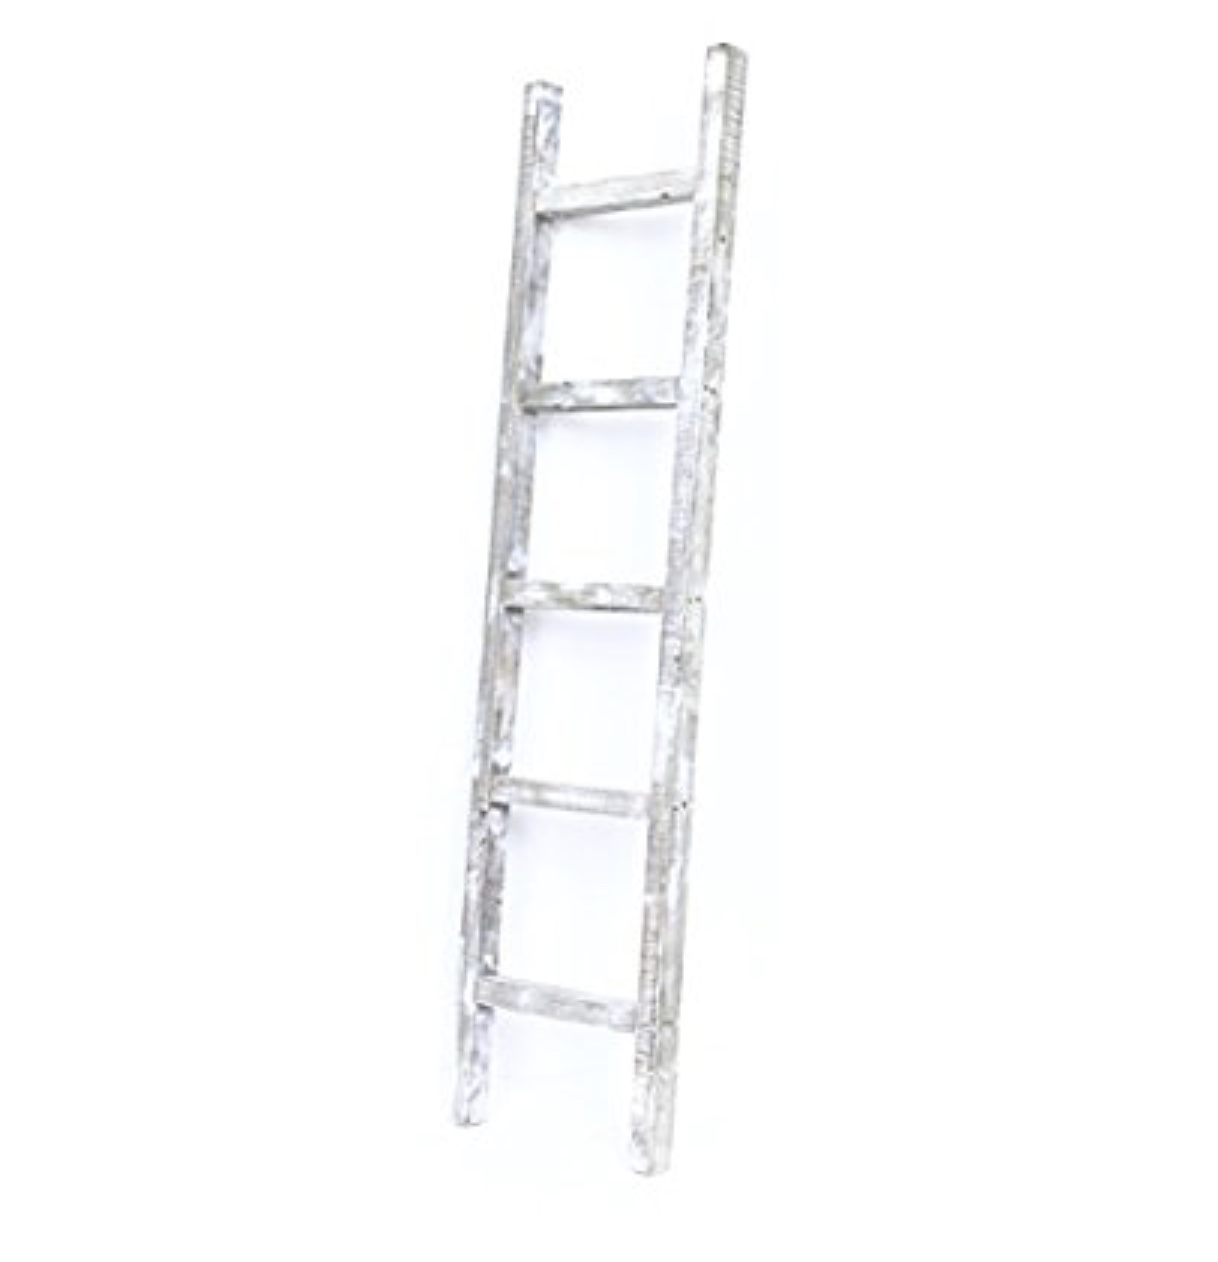 BarnwoodUSA Rustic Decorative Ladder, White Wash, 72inch